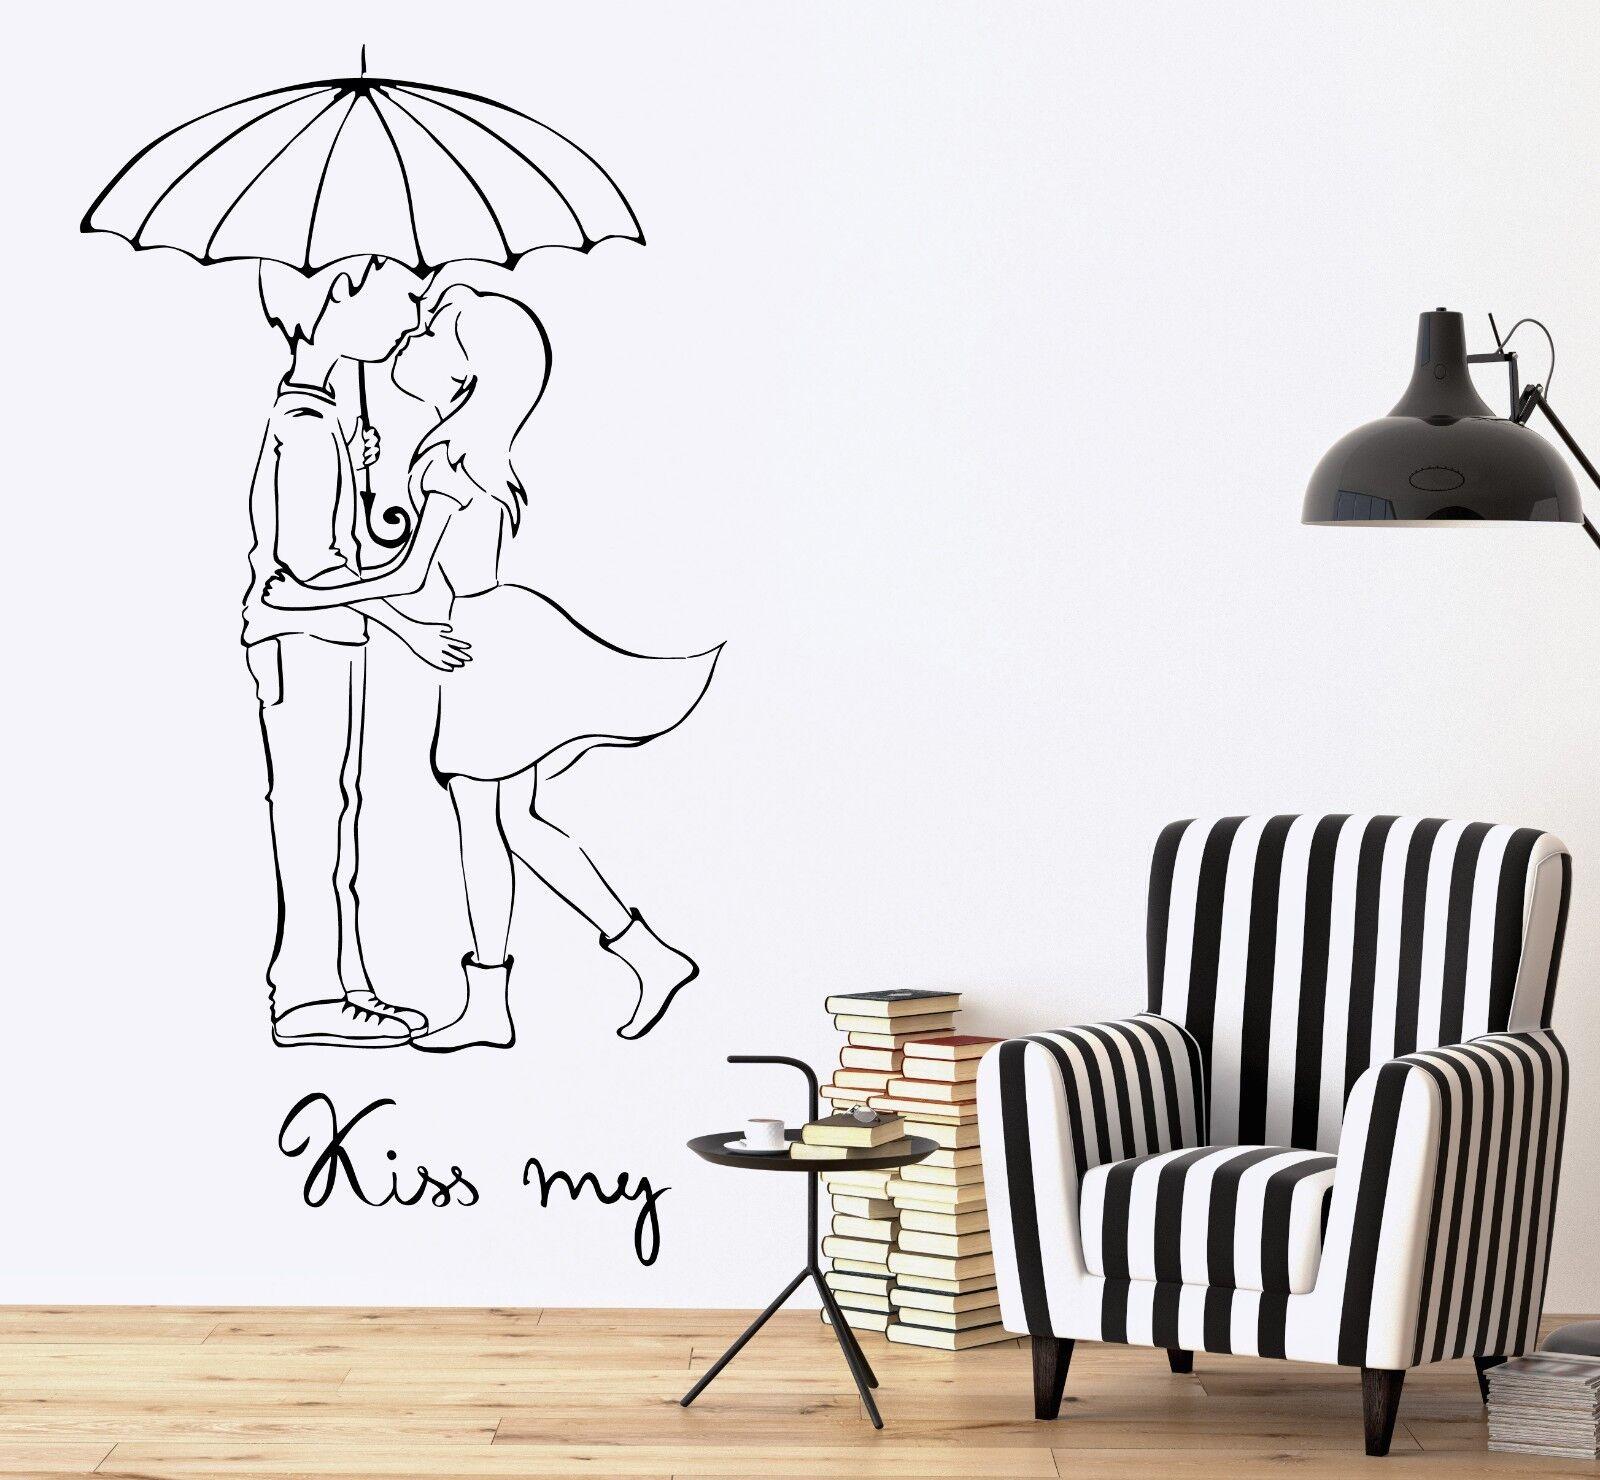 Wand Vinyl Decal Romantic Quotes Kiss Me Mädchen Boy Umbrella Amazing Decor z3698